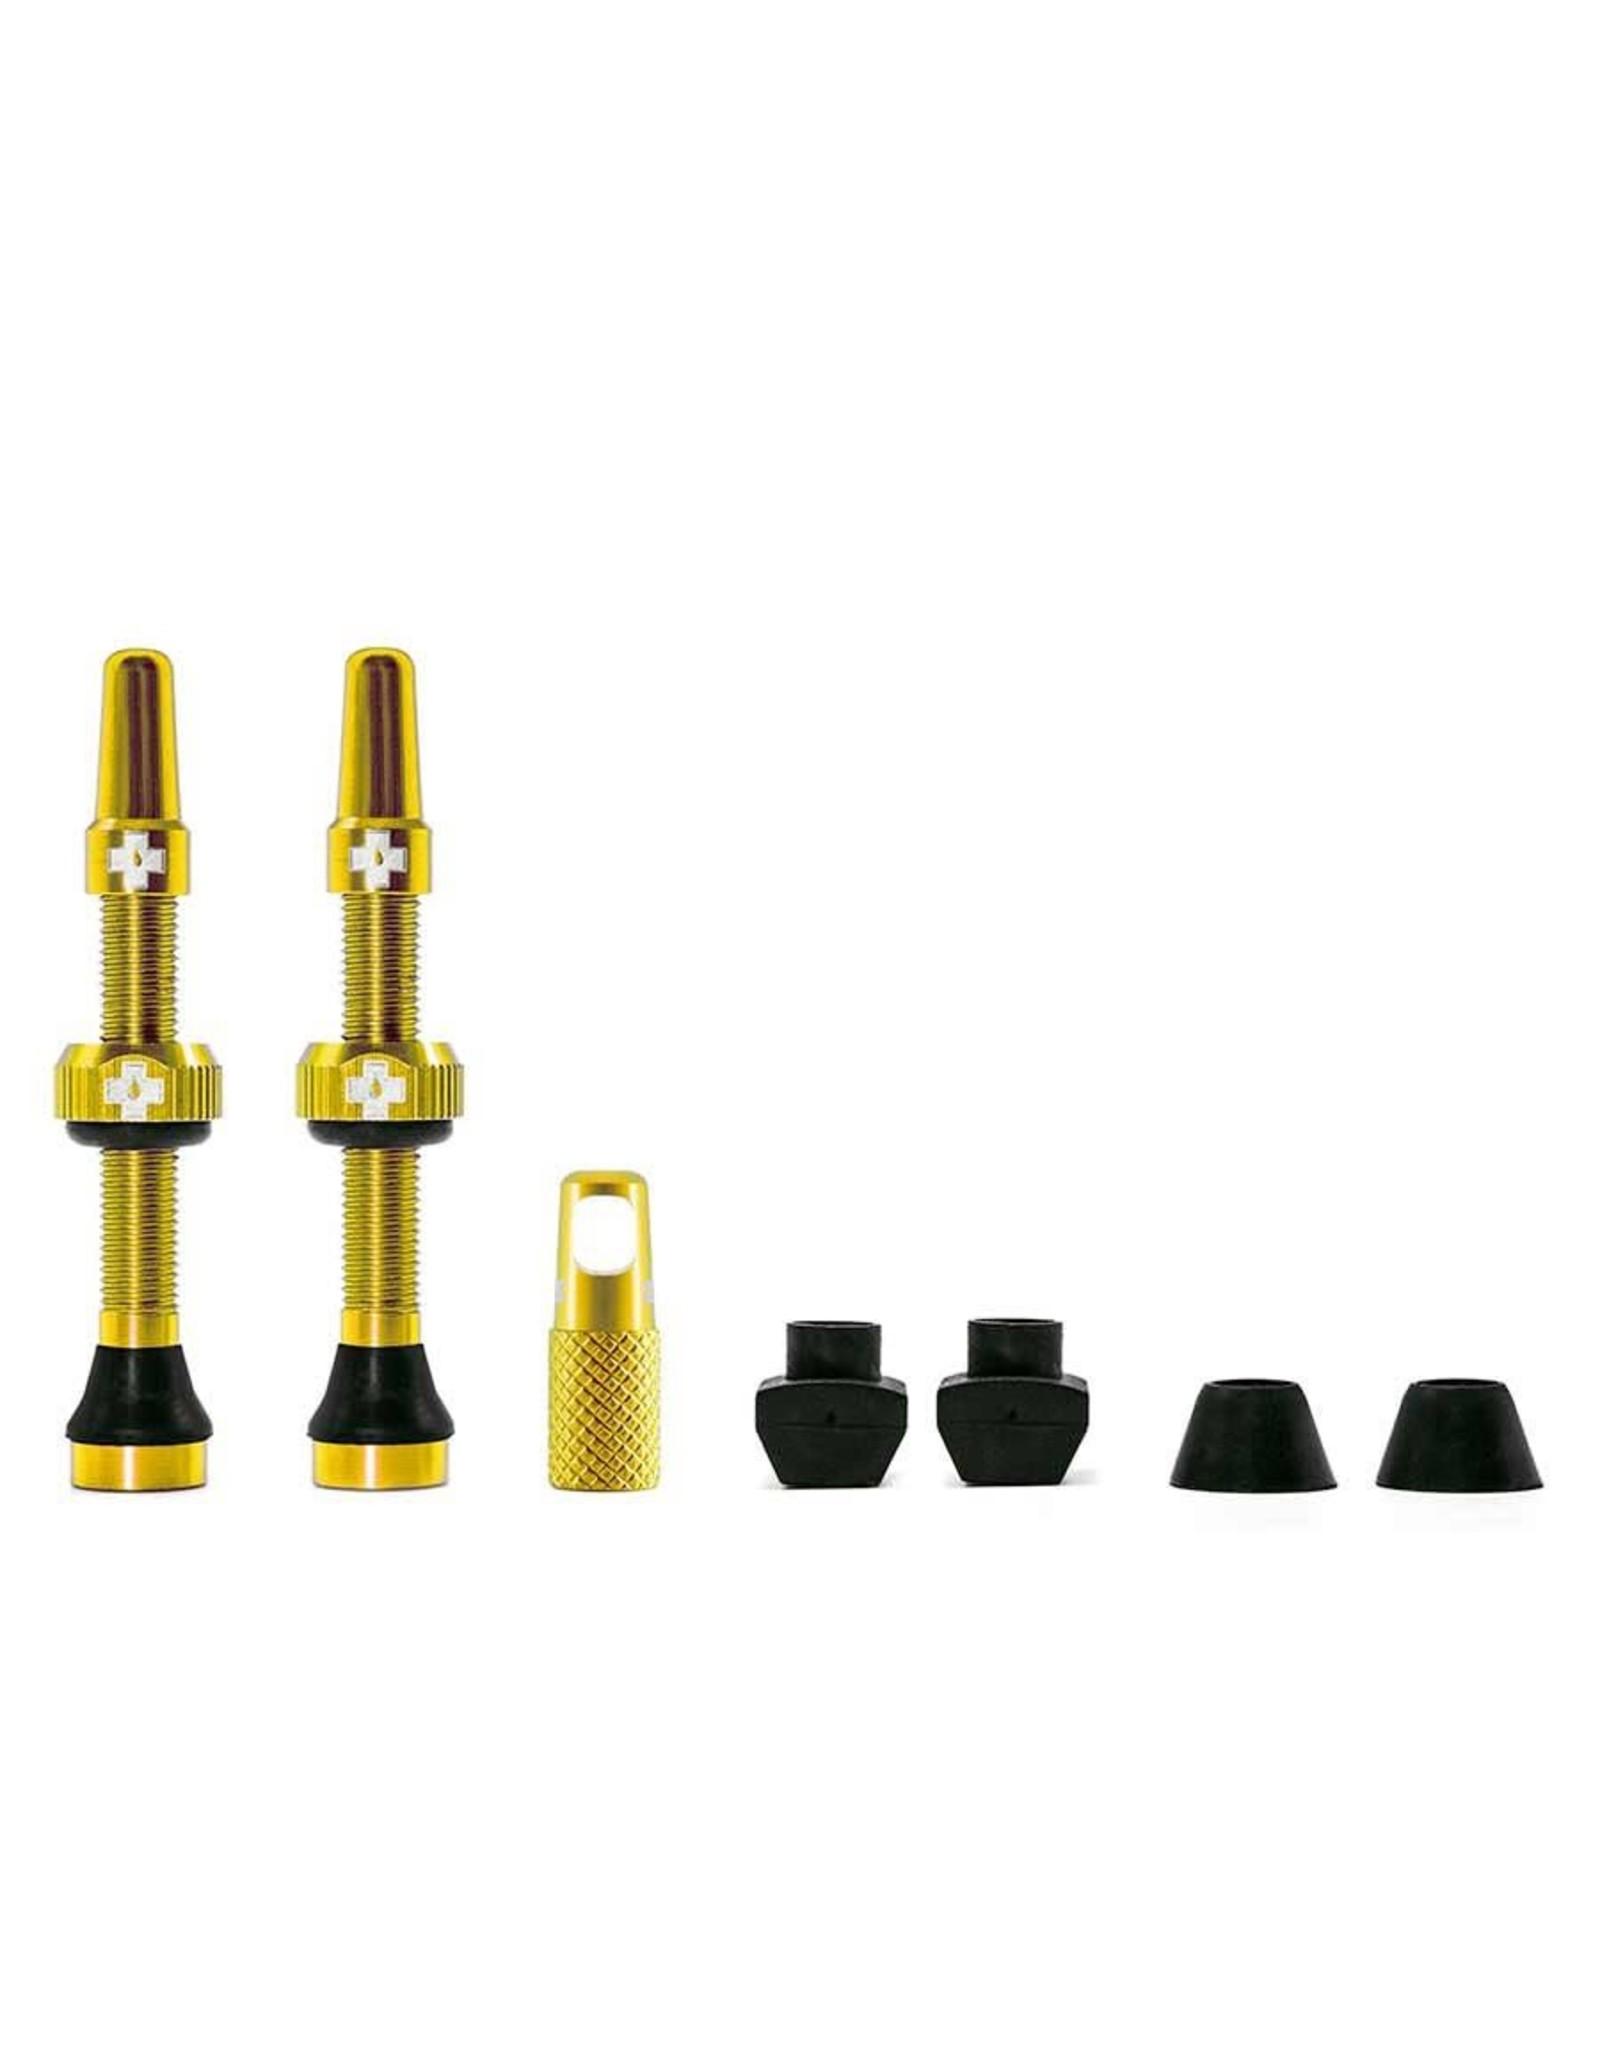 Muc-Off Muc-Off presta tubeless valves